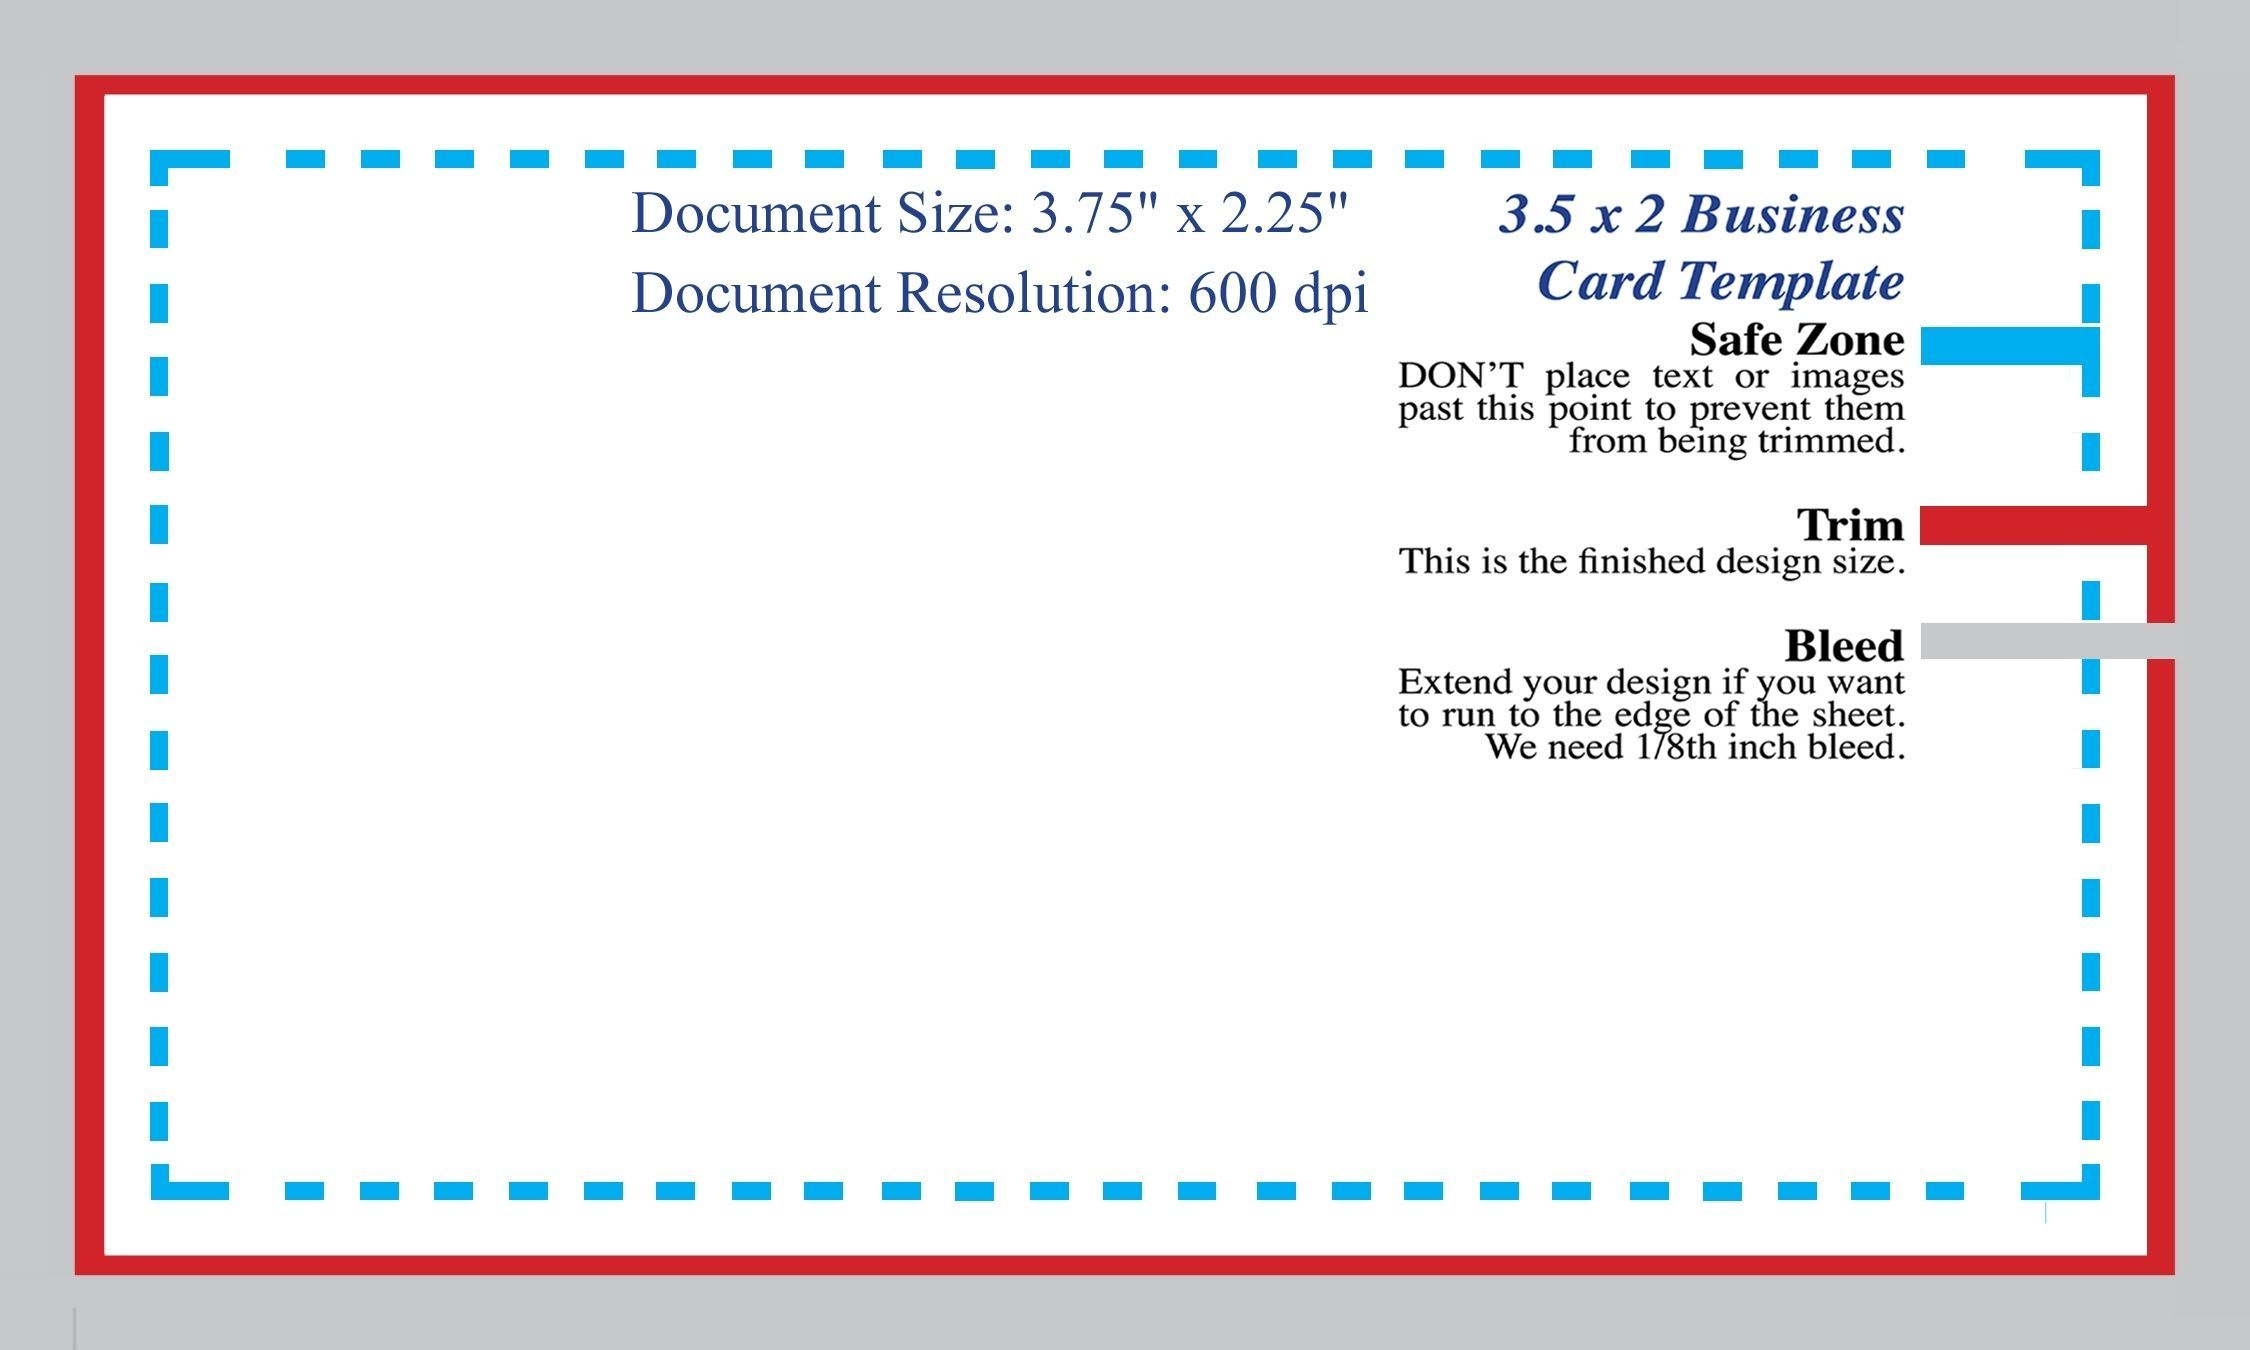 Standard Business Card Blank Template Photoshop Template Pertaining To Name Card Template Photoshop